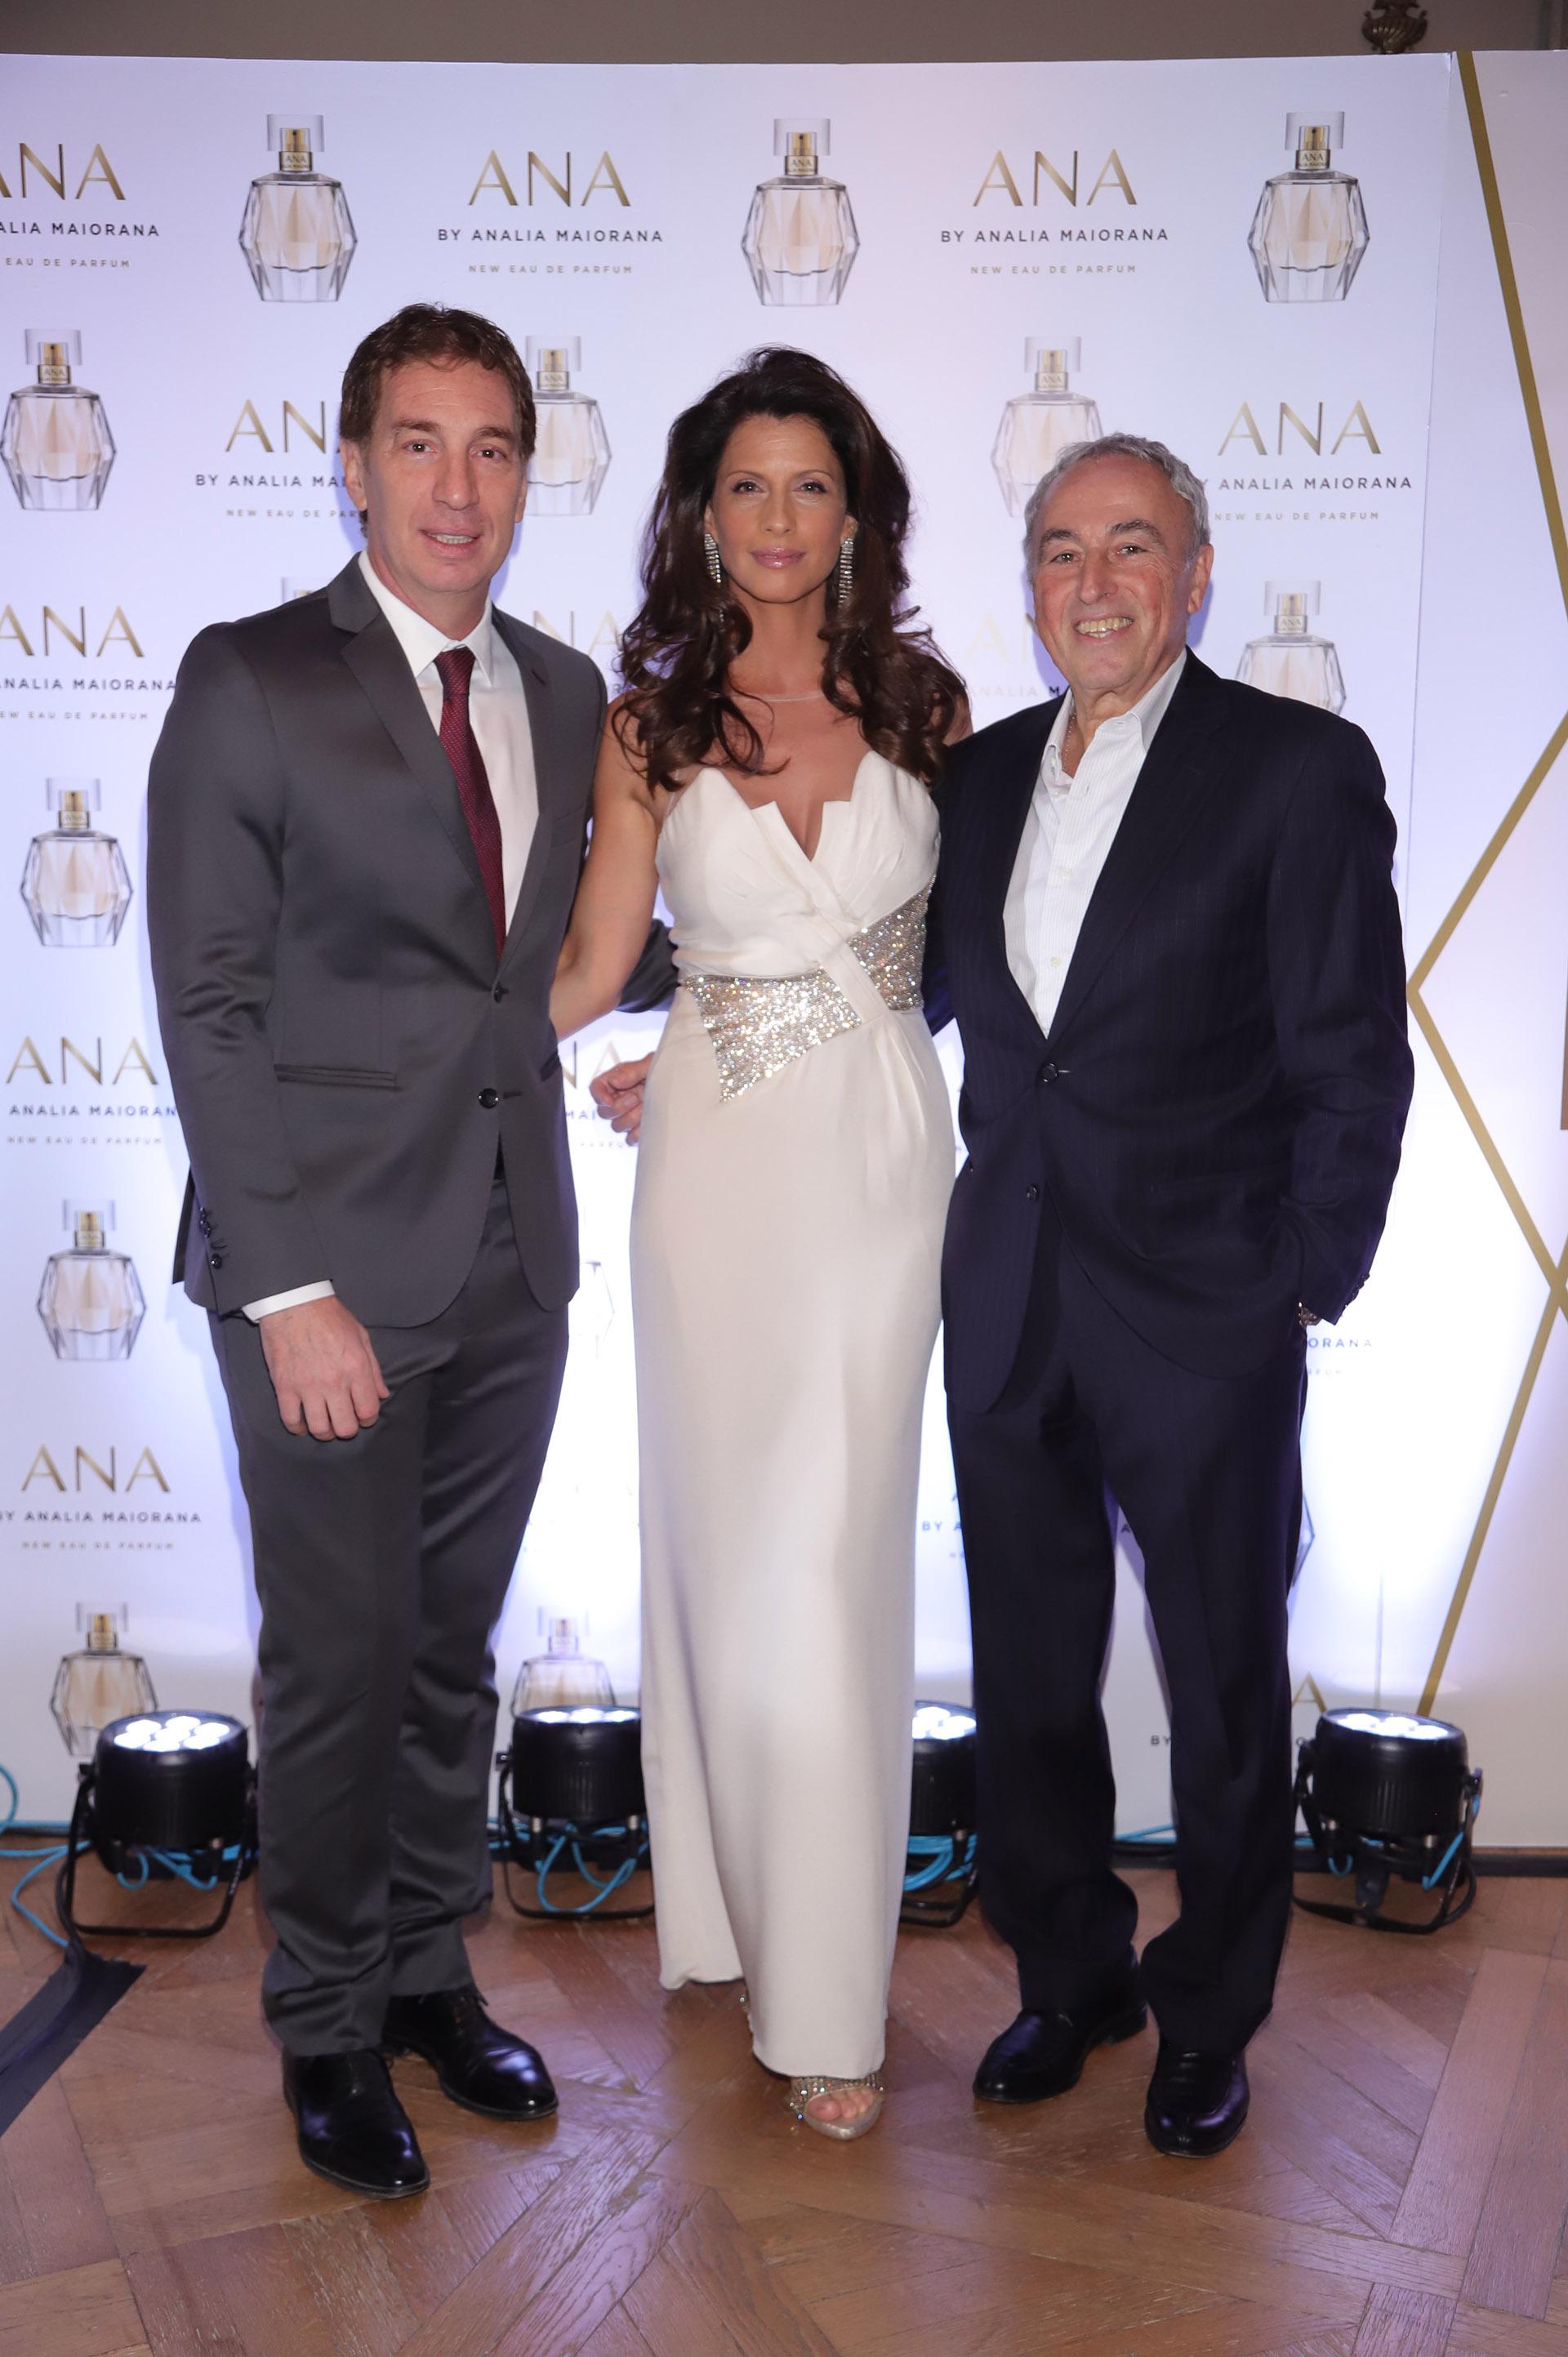 Diego Santilli, Analía Maiorana e Israel Sutton